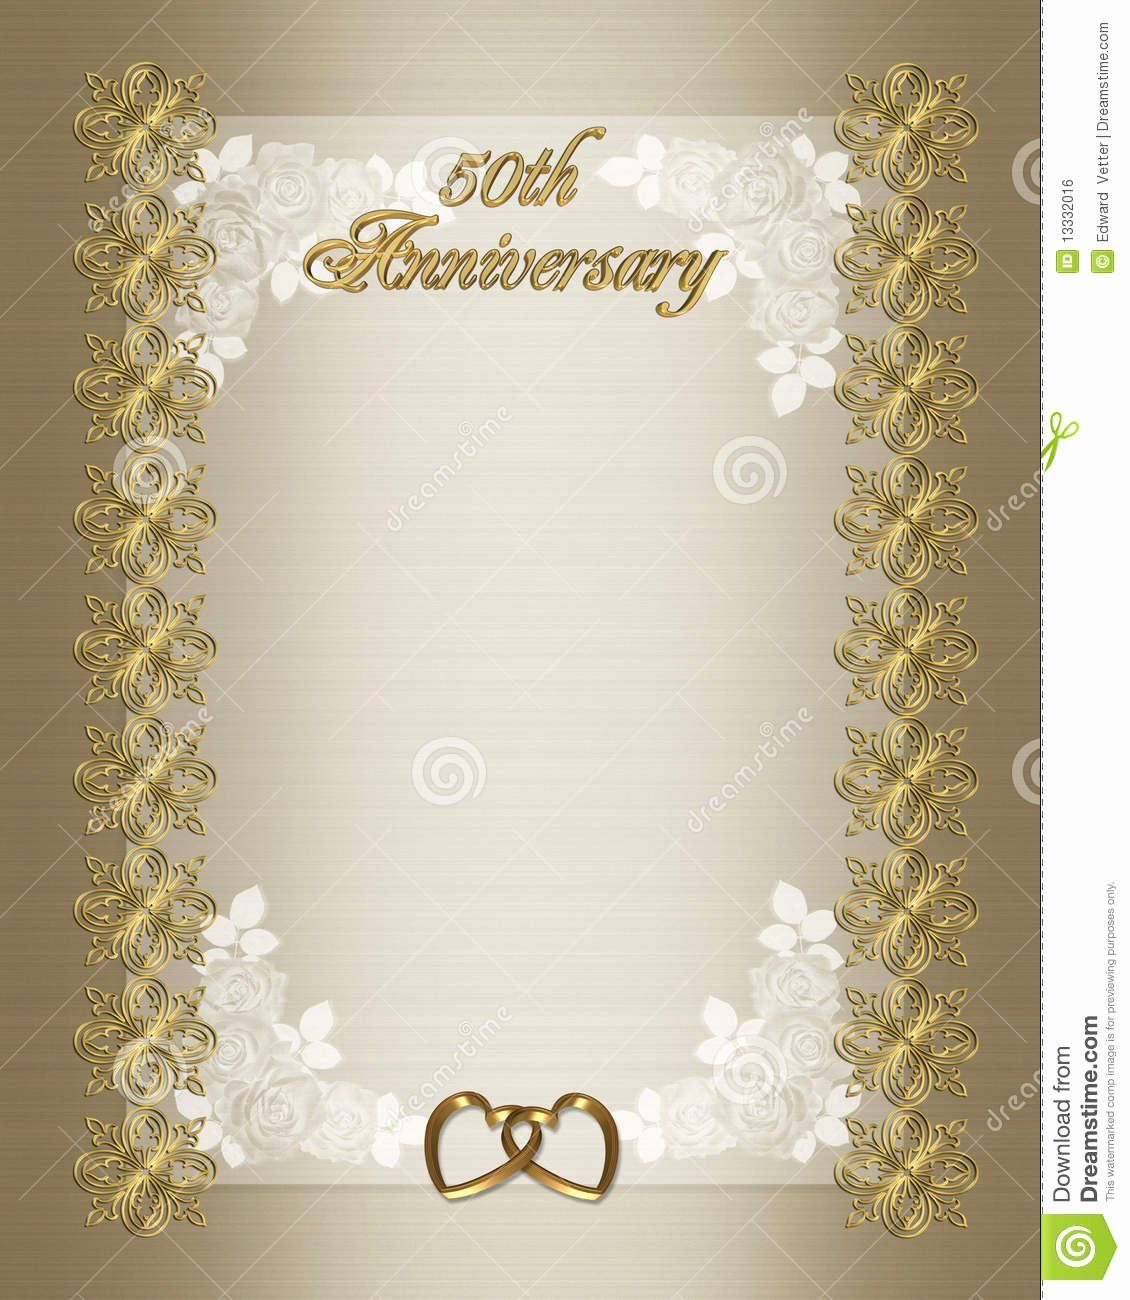 Free 50th Anniversary Invitation Templates Lovely 50th Weddin 50th Wedding Anniversary Invitations Wedding Anniversary Invitations 50th Anniversary Invitations